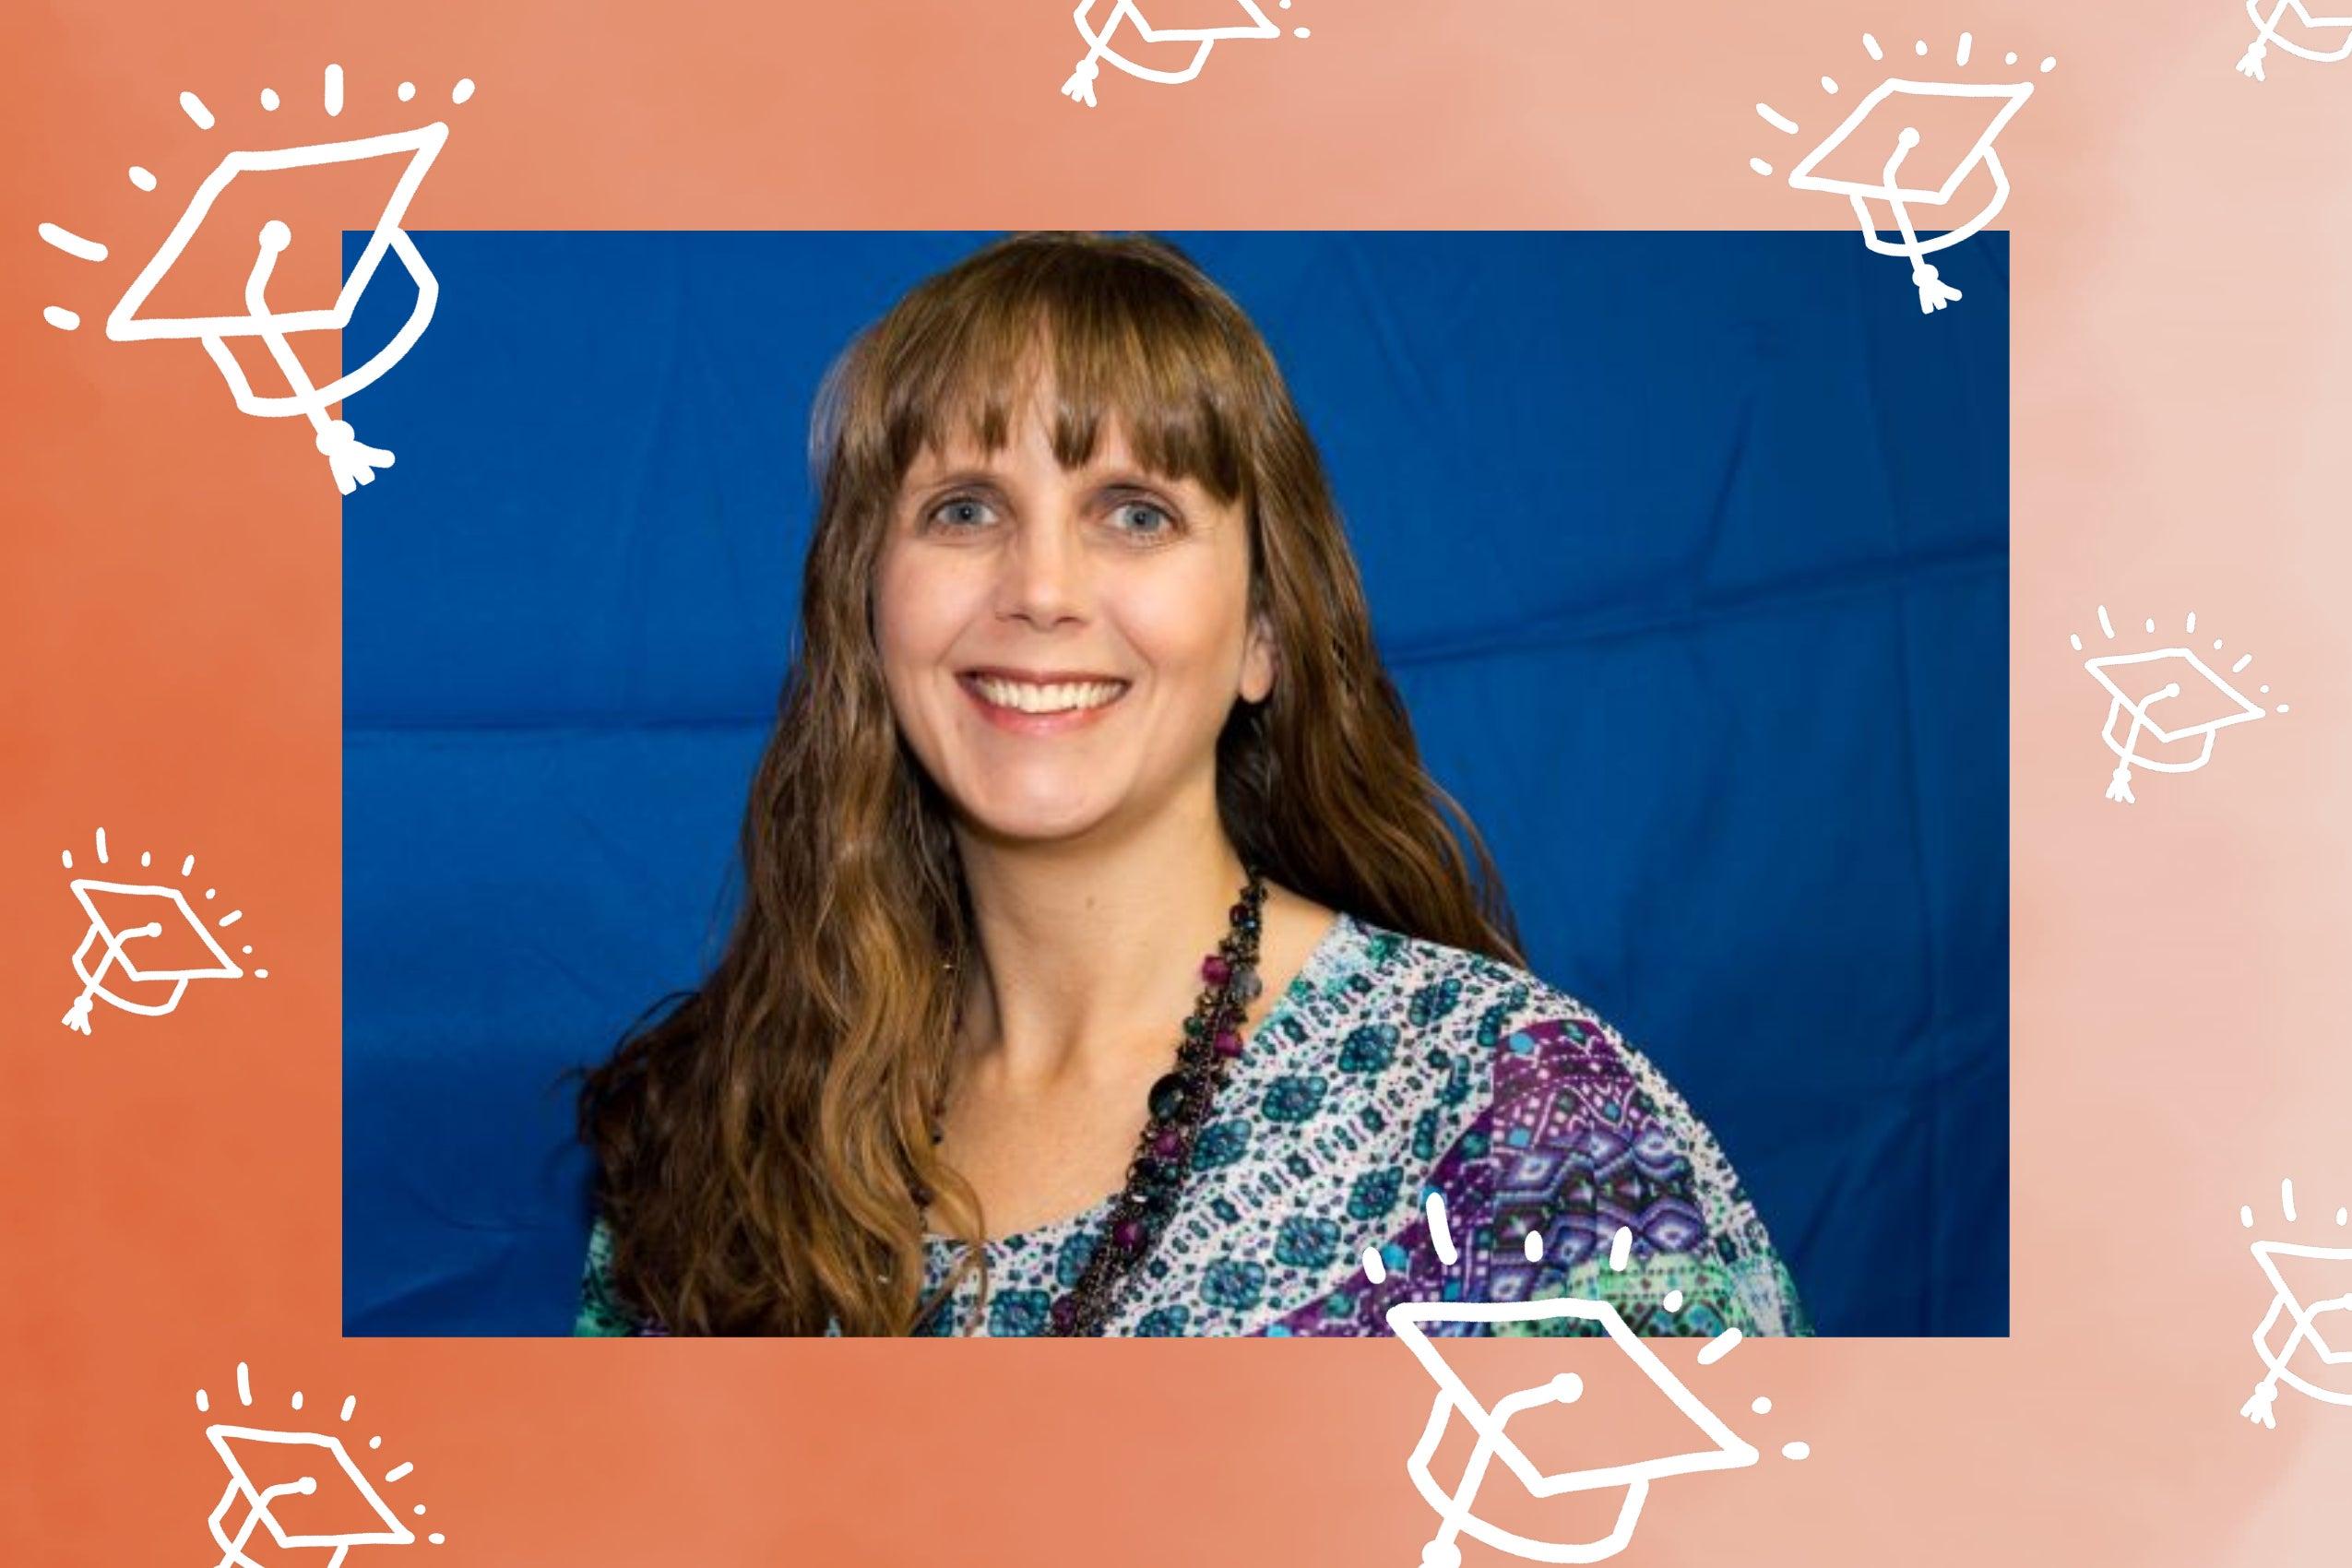 Beth Schumacher Master of Science in Accountancy graduate.